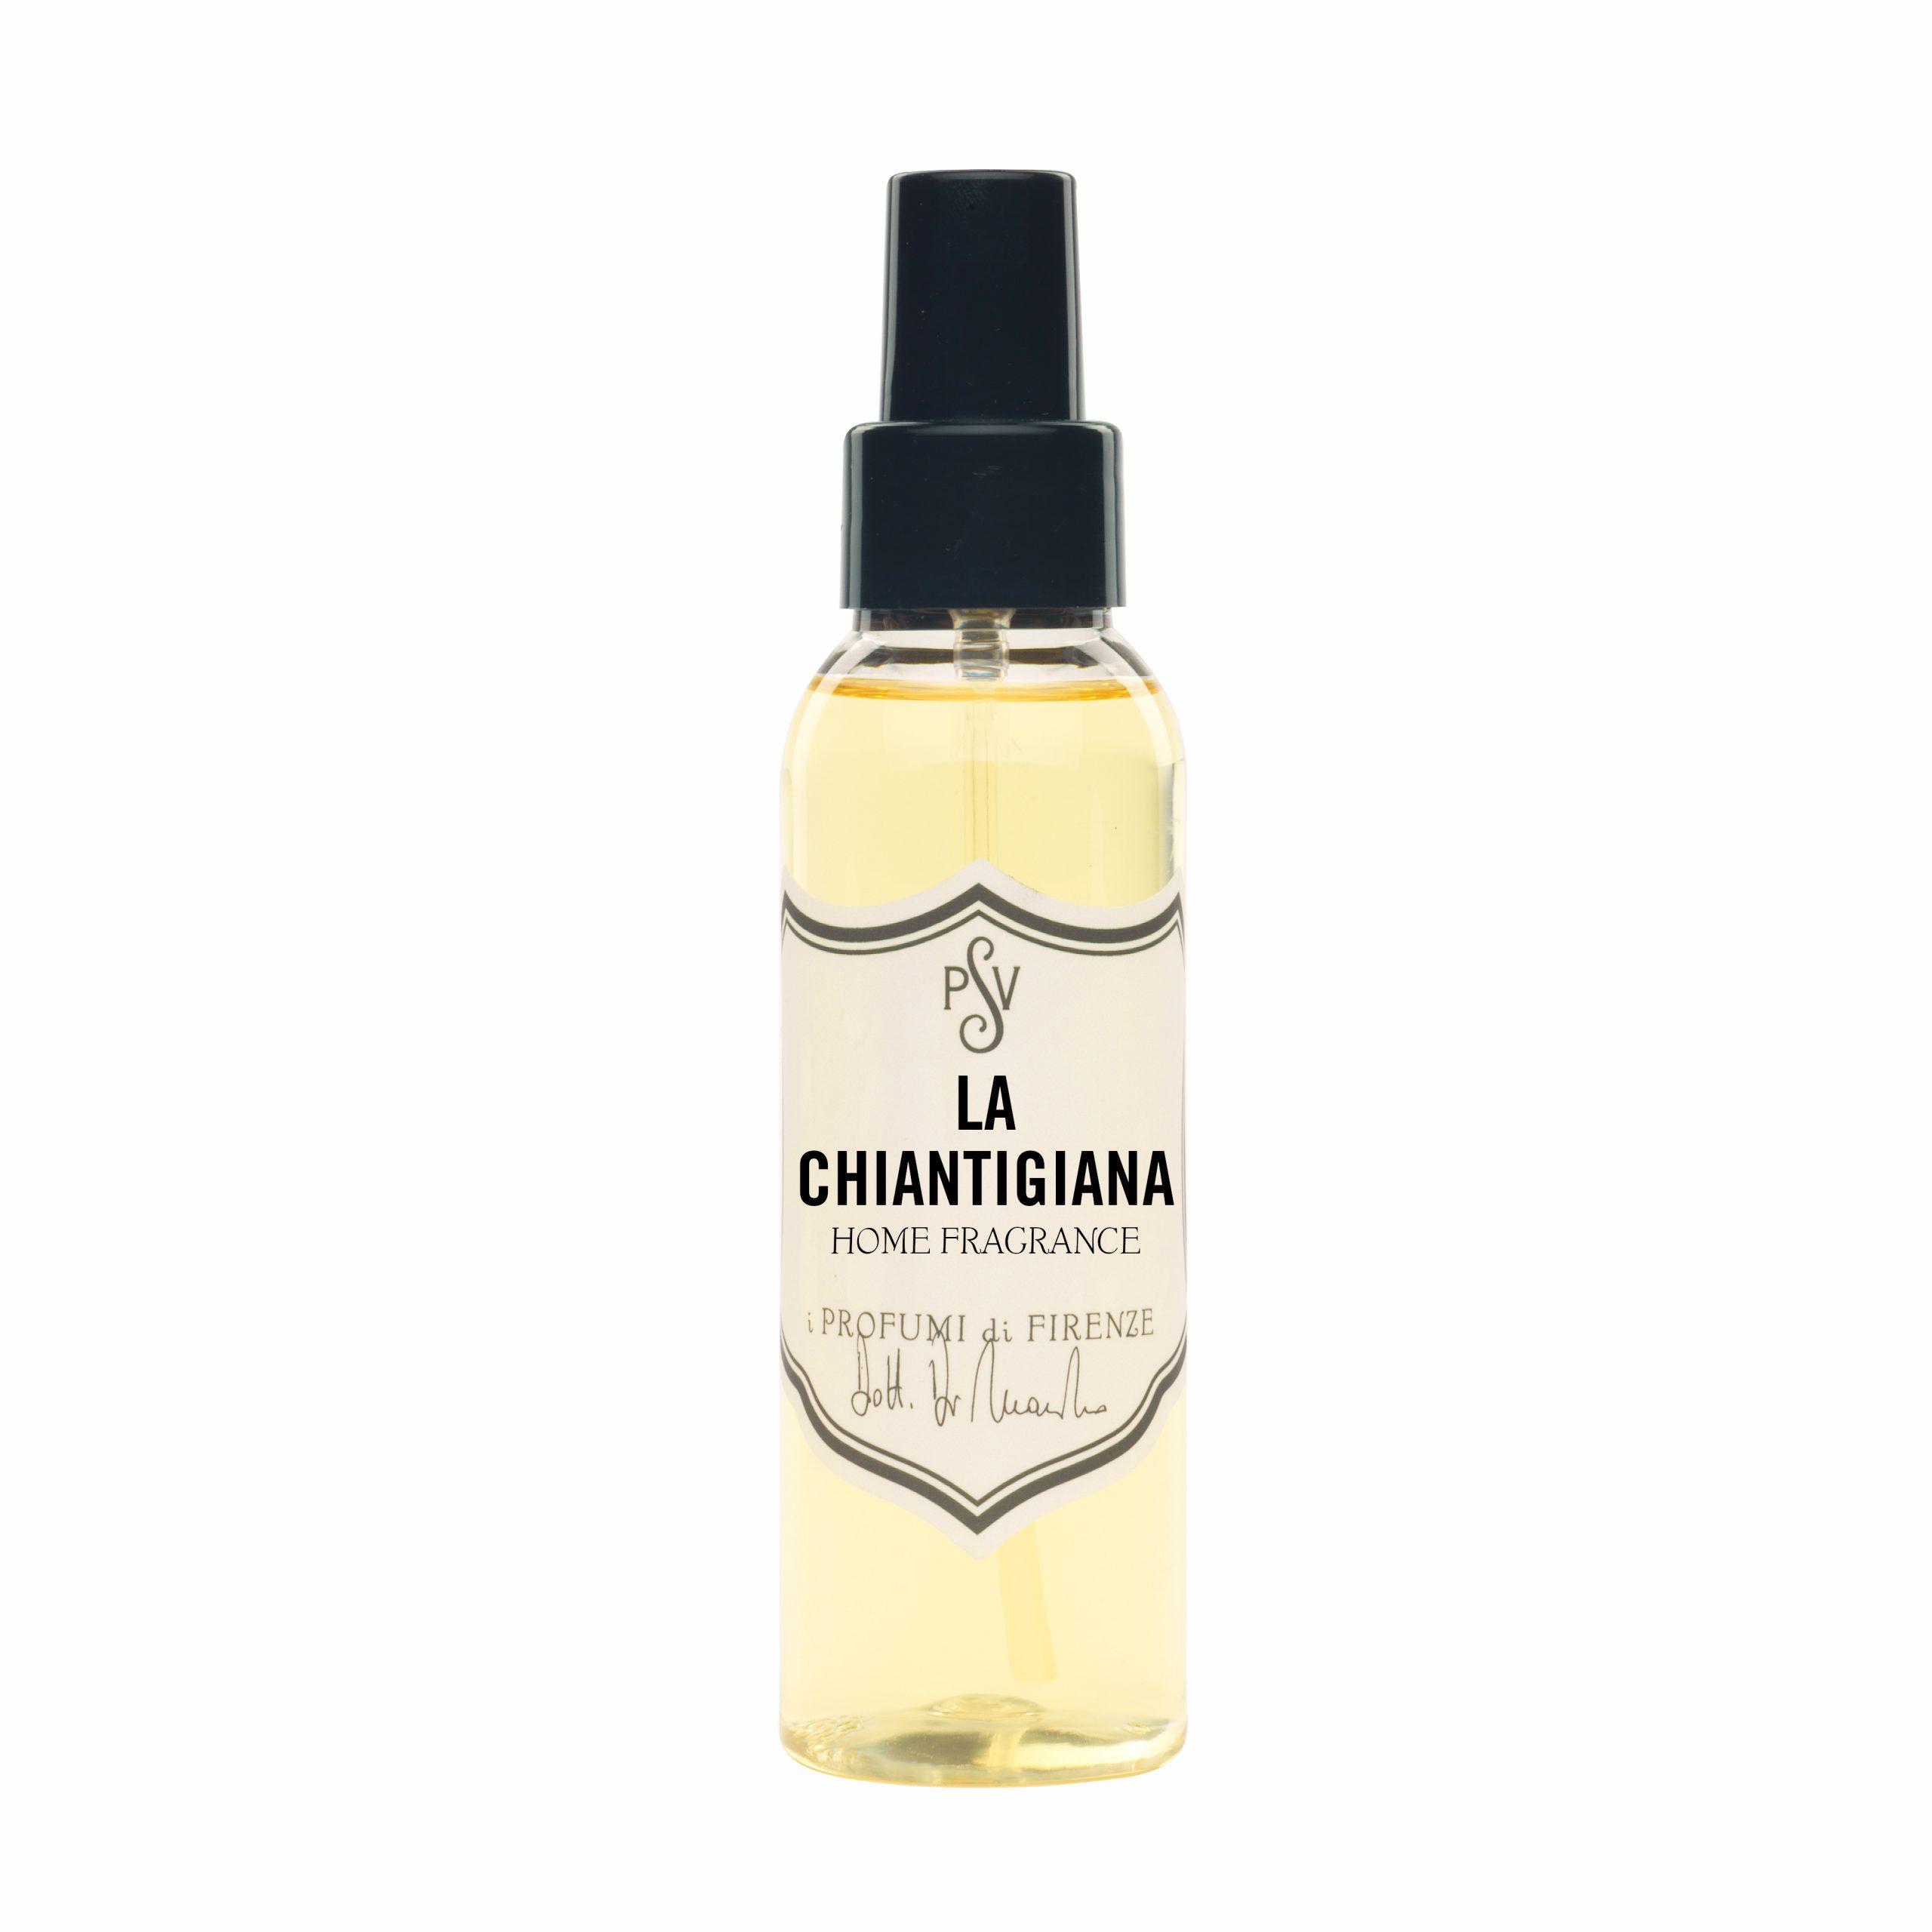 LA CHIANTIGIANA 100 ml - Deo Ambiente Spray-0